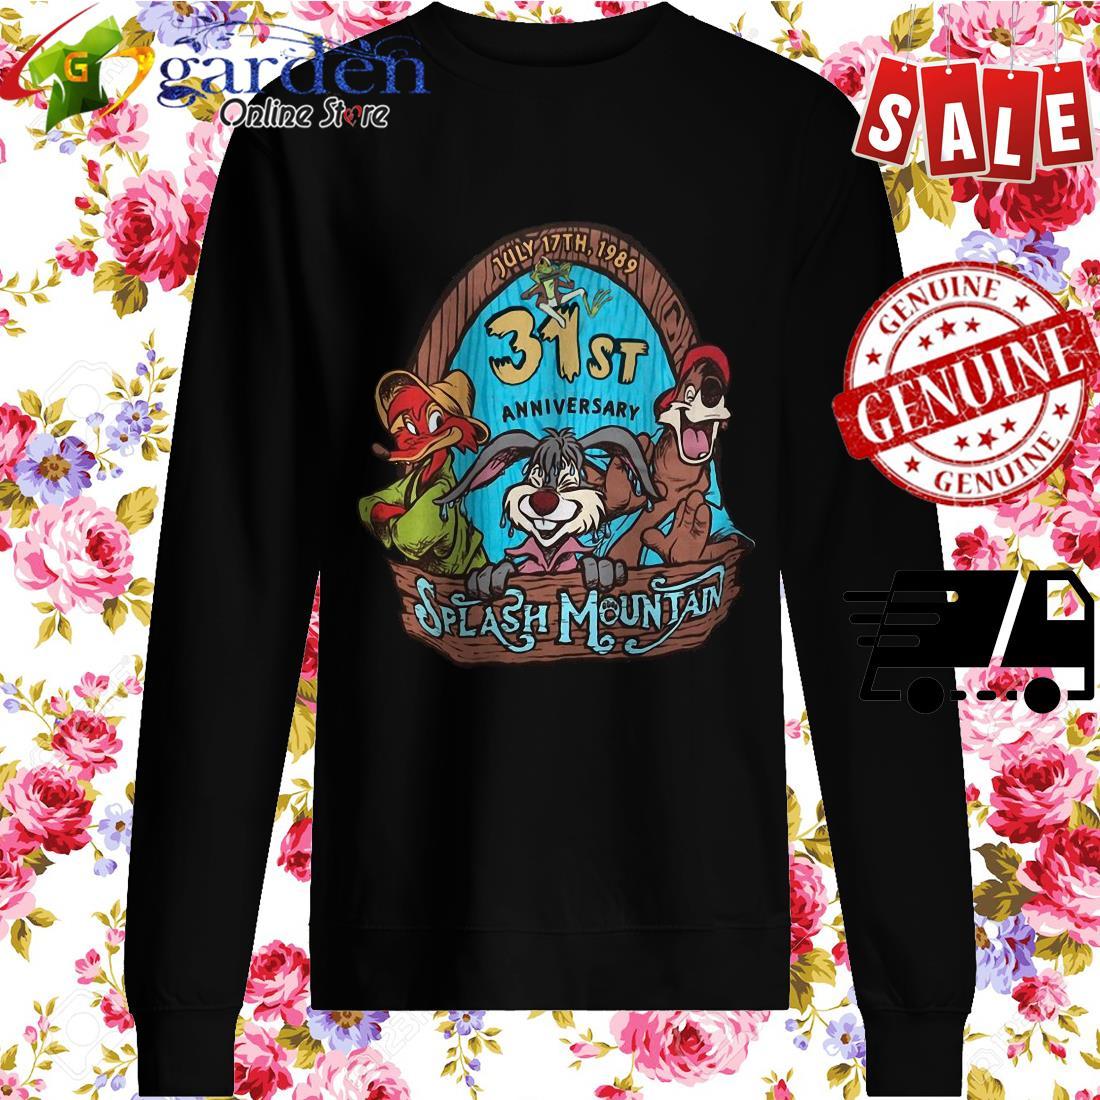 30st Anniversary Splash Mountain sweater